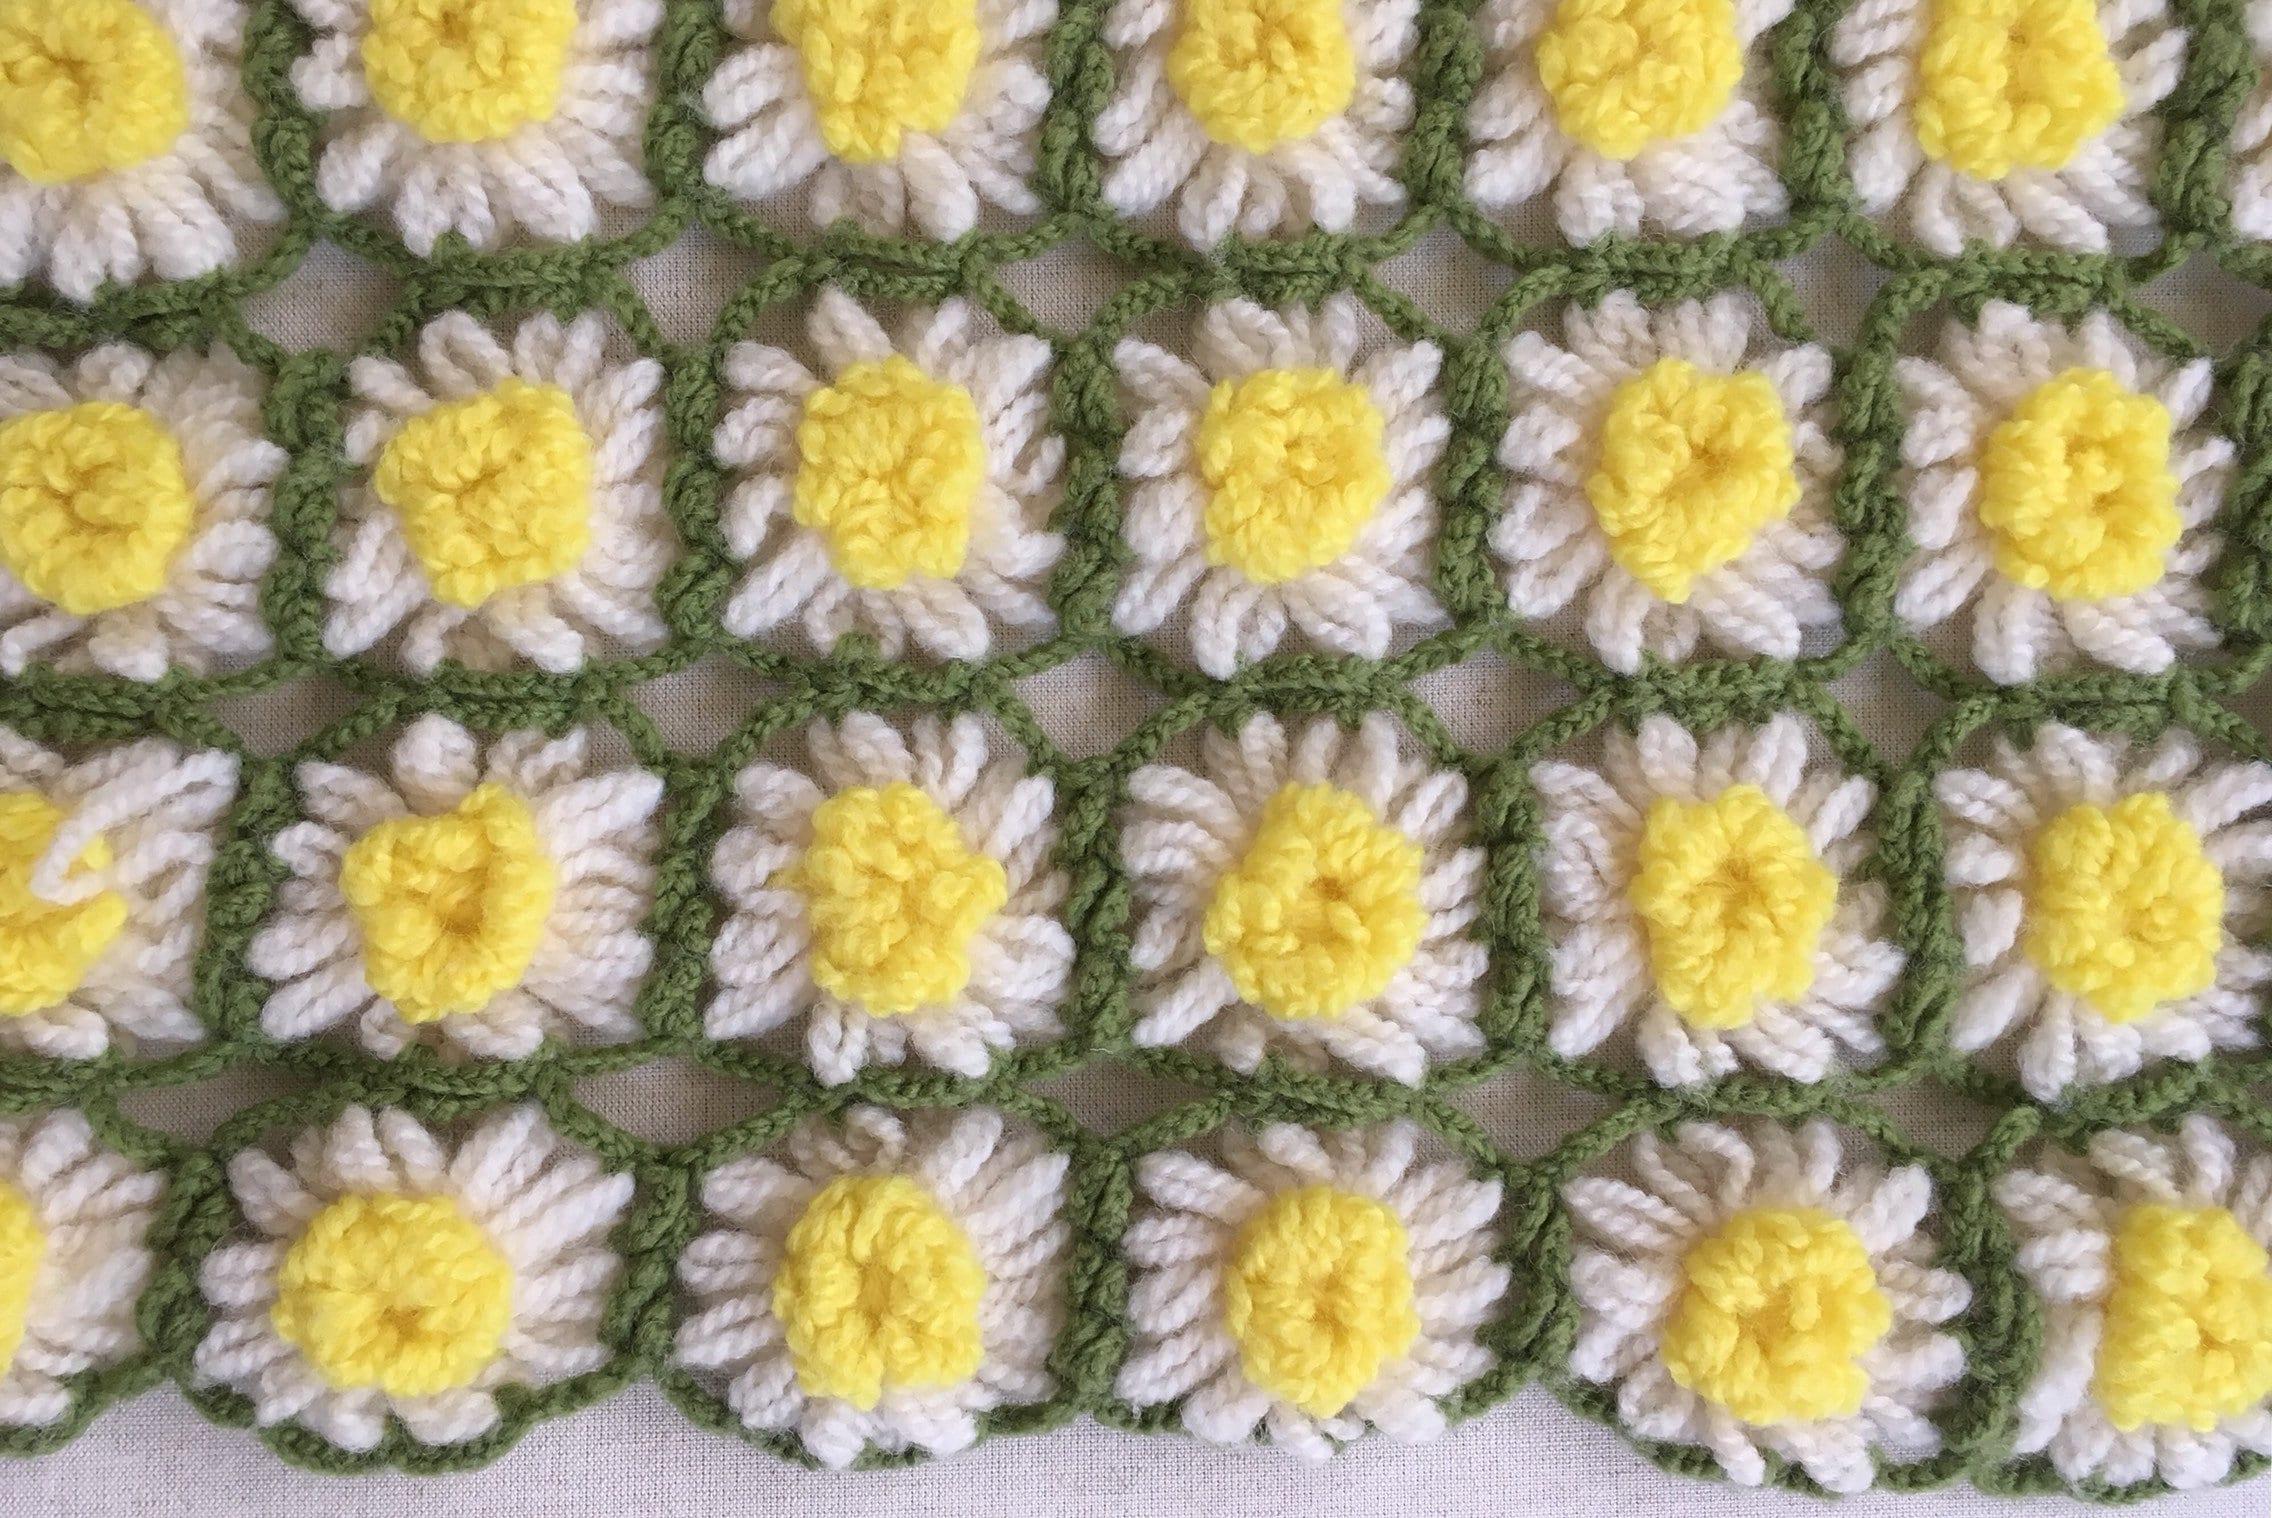 Wool daisy crochet blanket throw afghan vintage handmade hand knit wool daisy crochet blanket throw afghan vintage handmade hand knit white yellow flowers izmirmasajfo